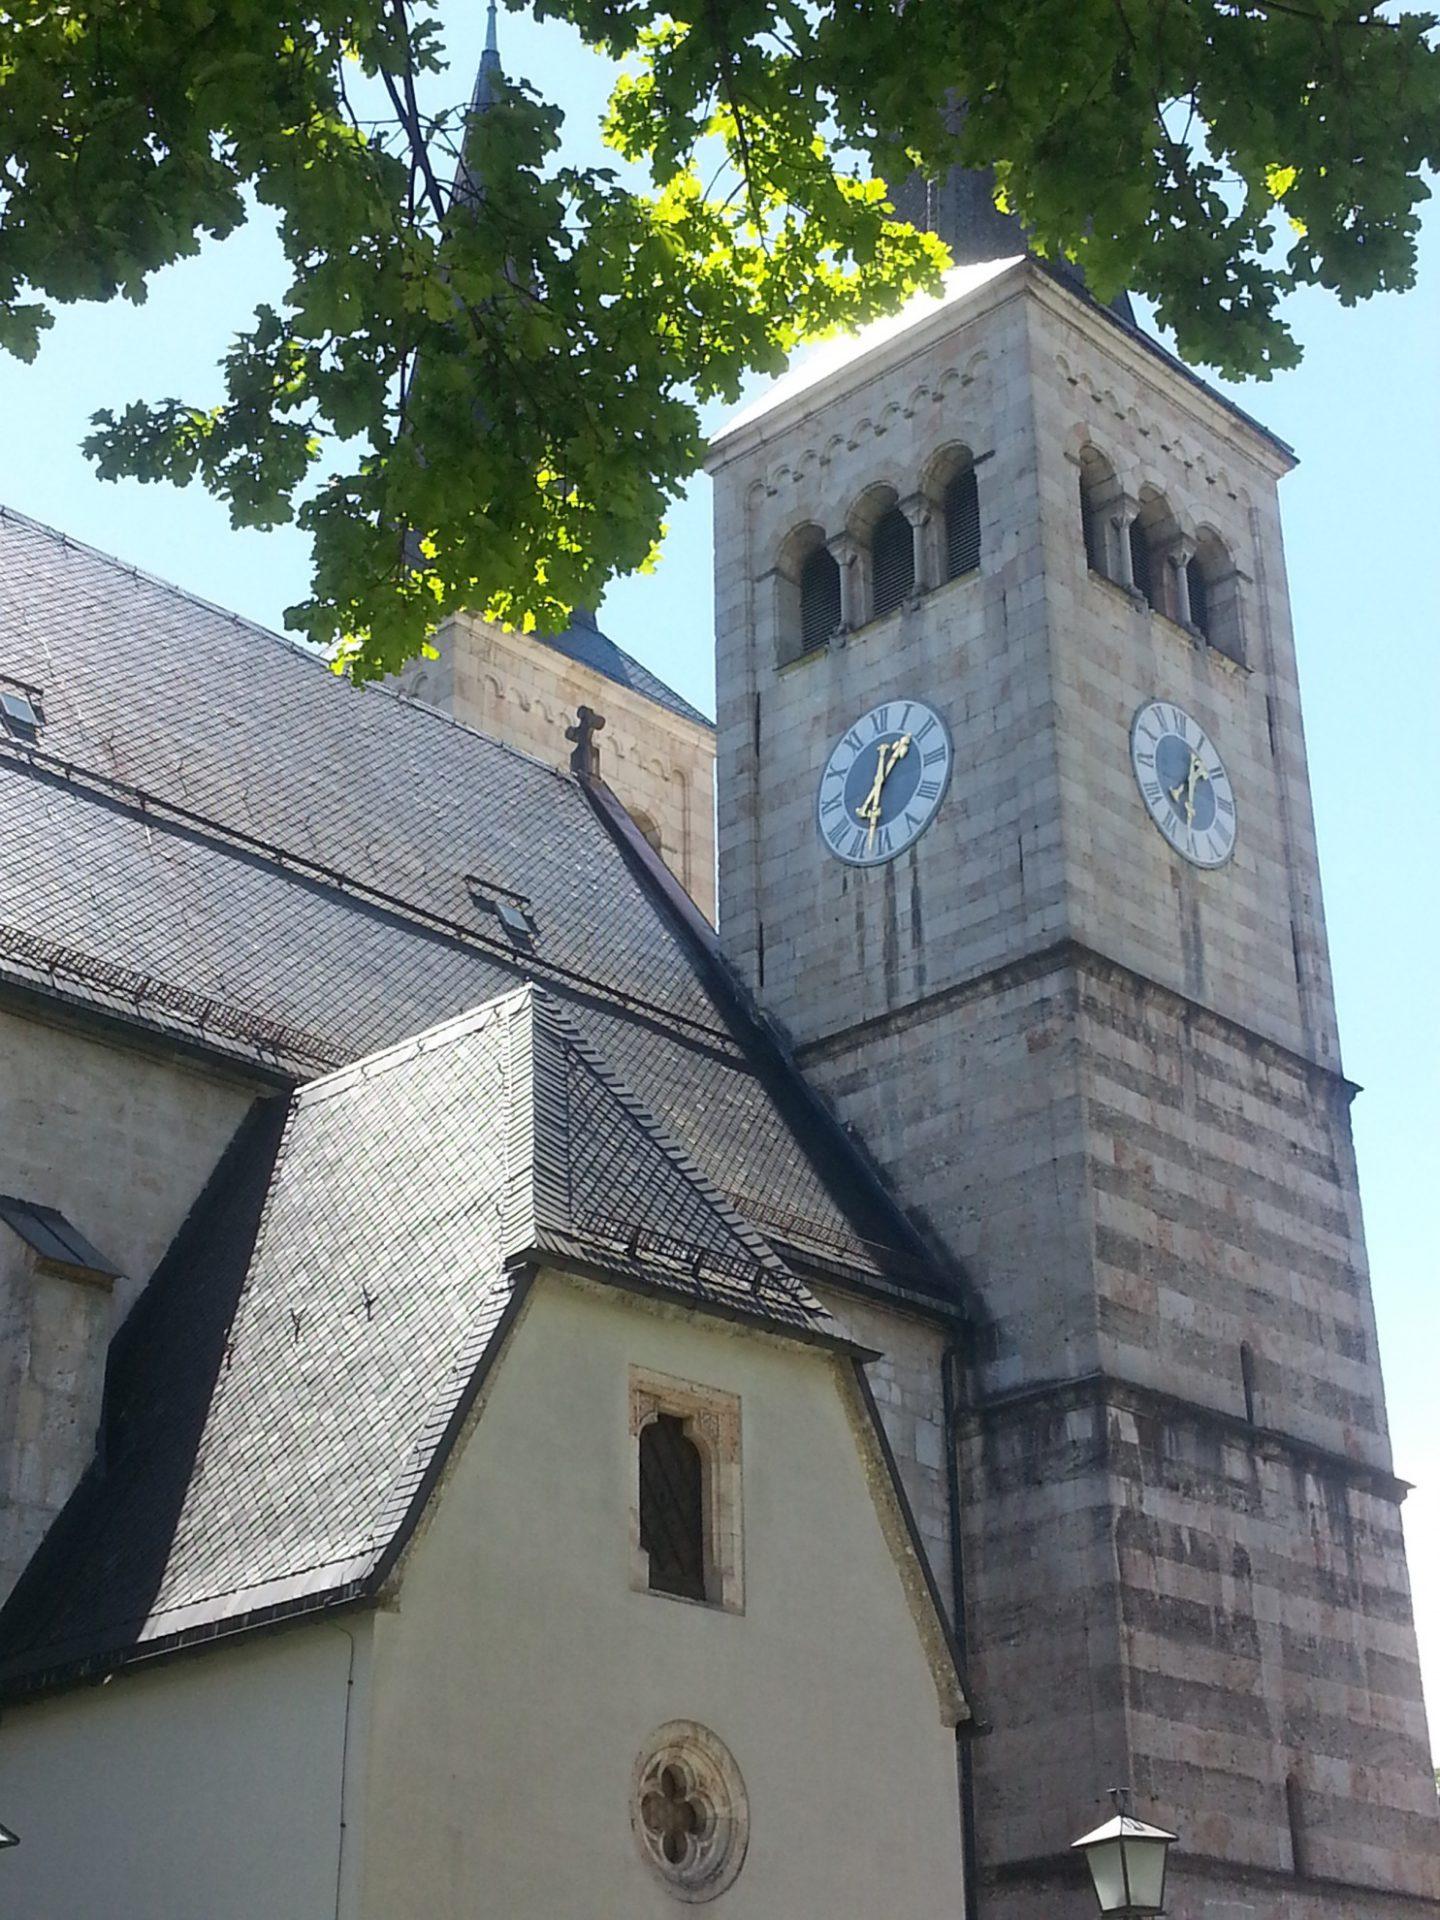 Stiftskirche St. Peter und Johannis der Täufer Berchtesgaden